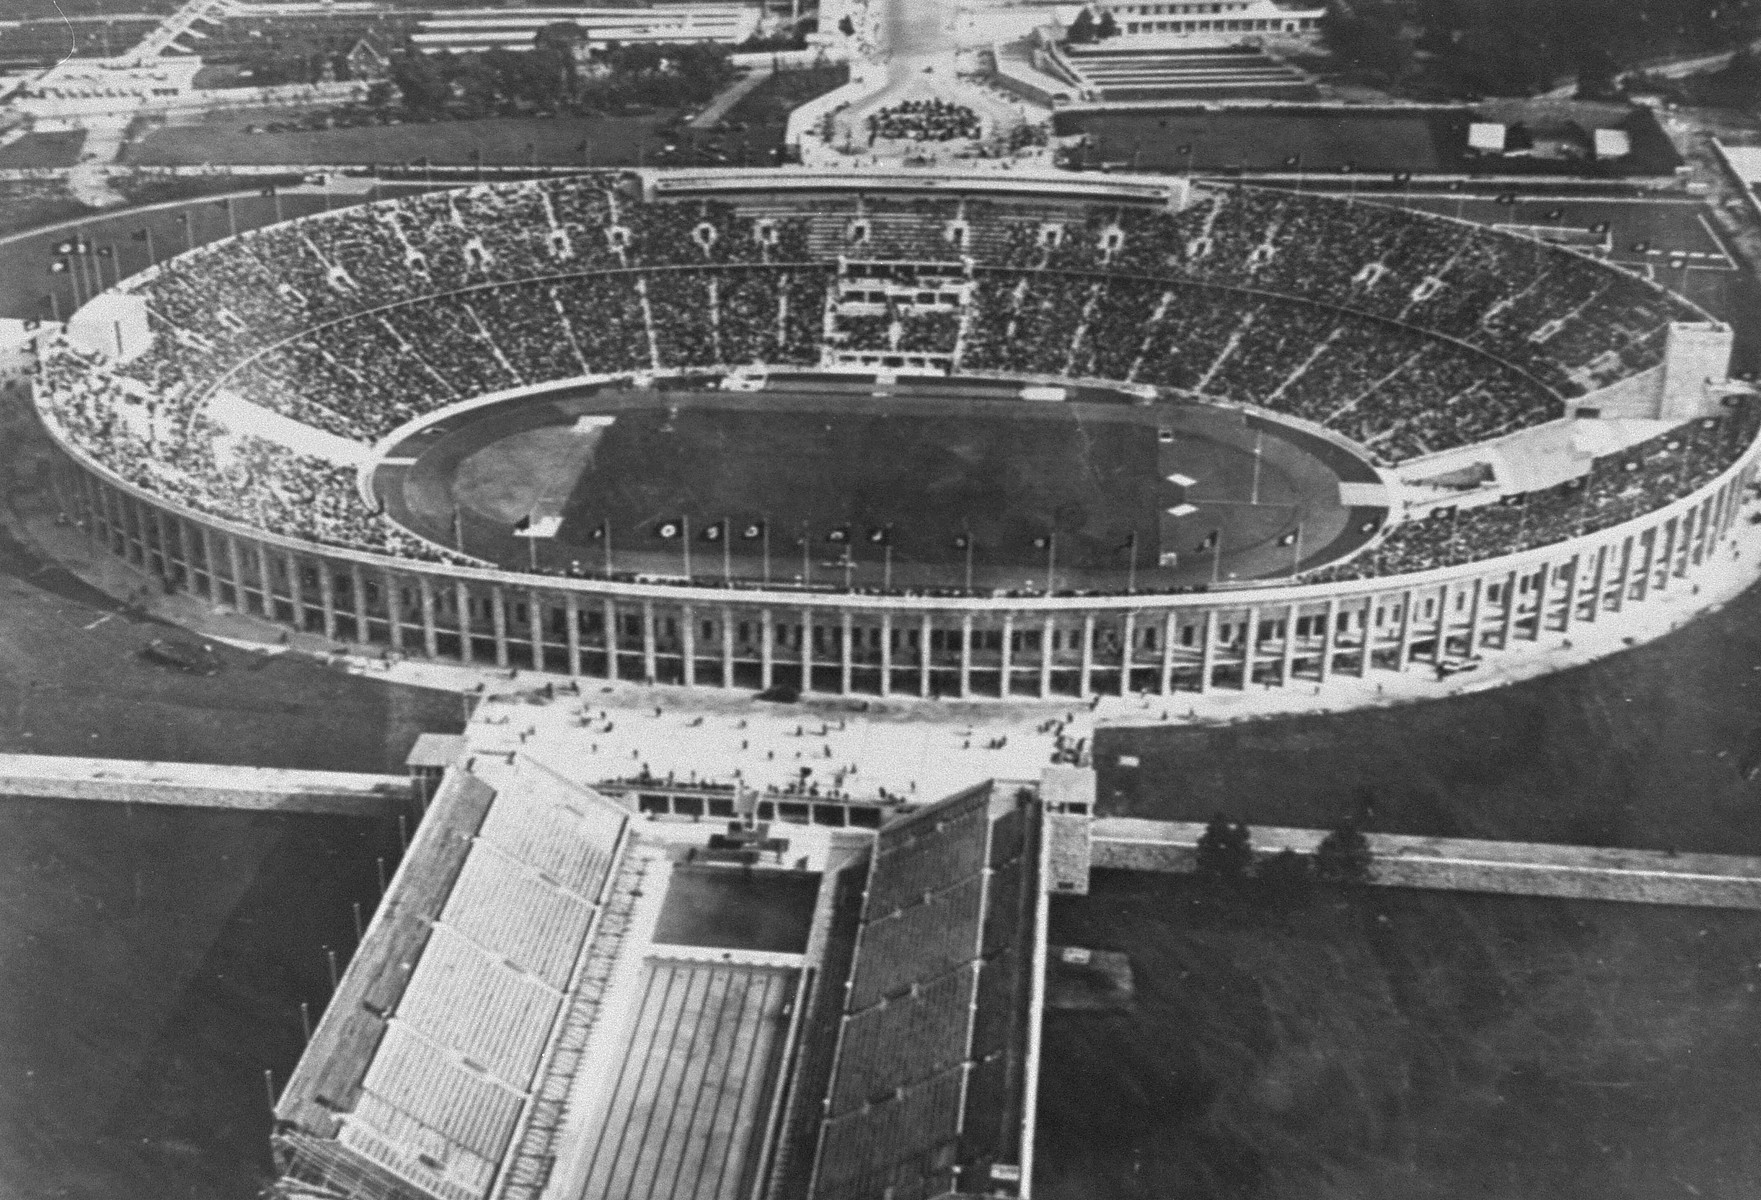 The Olympic stadium in Berlin.